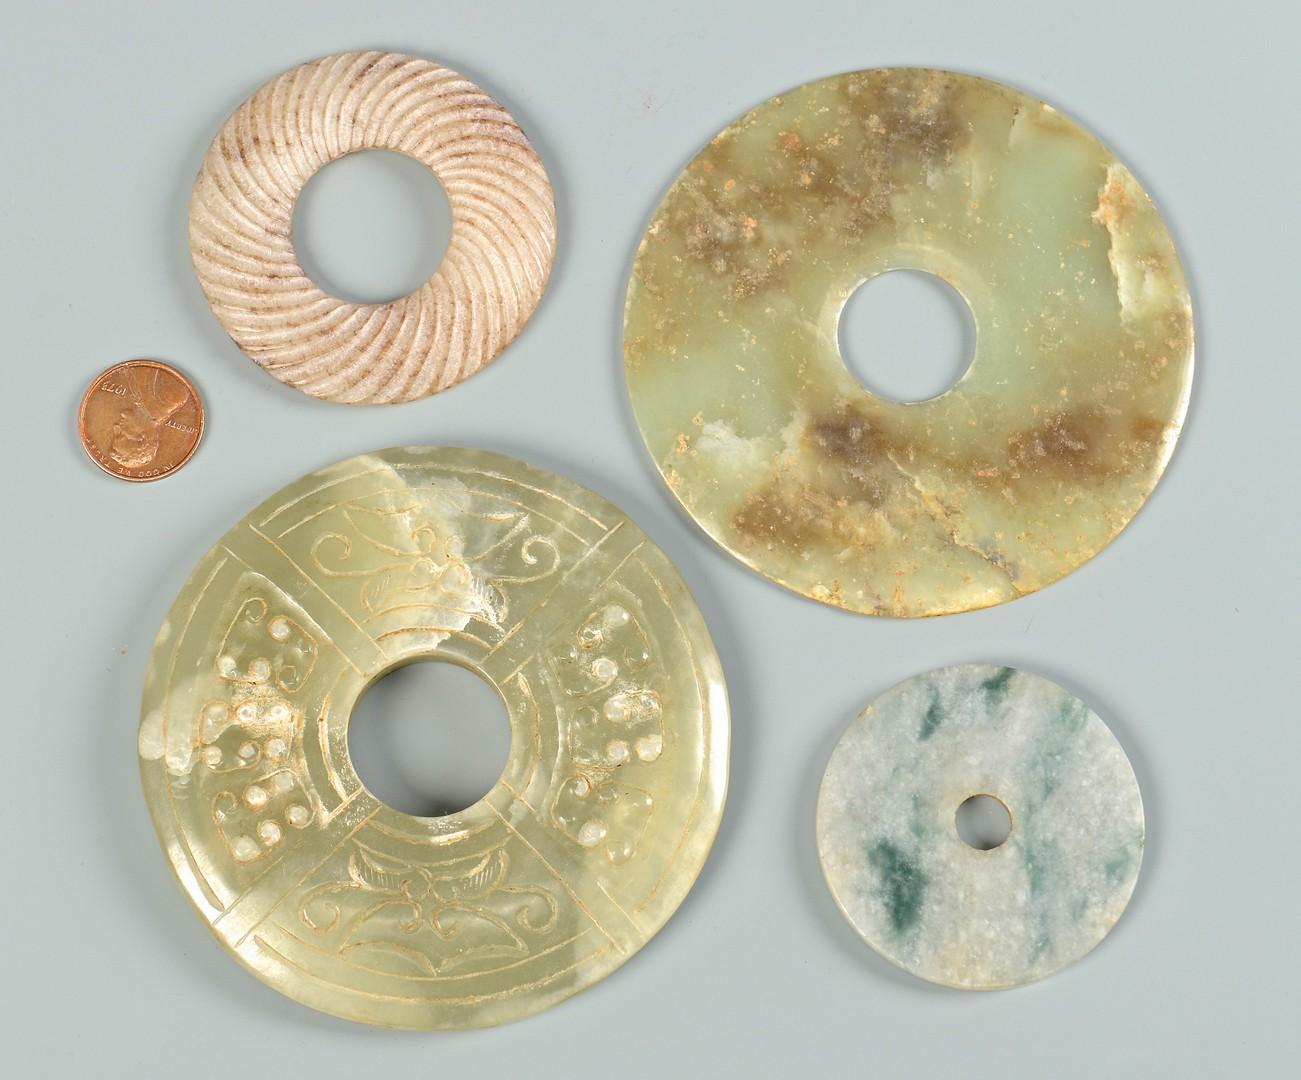 Lot 705: Jade bi discs and axe head, 5 items